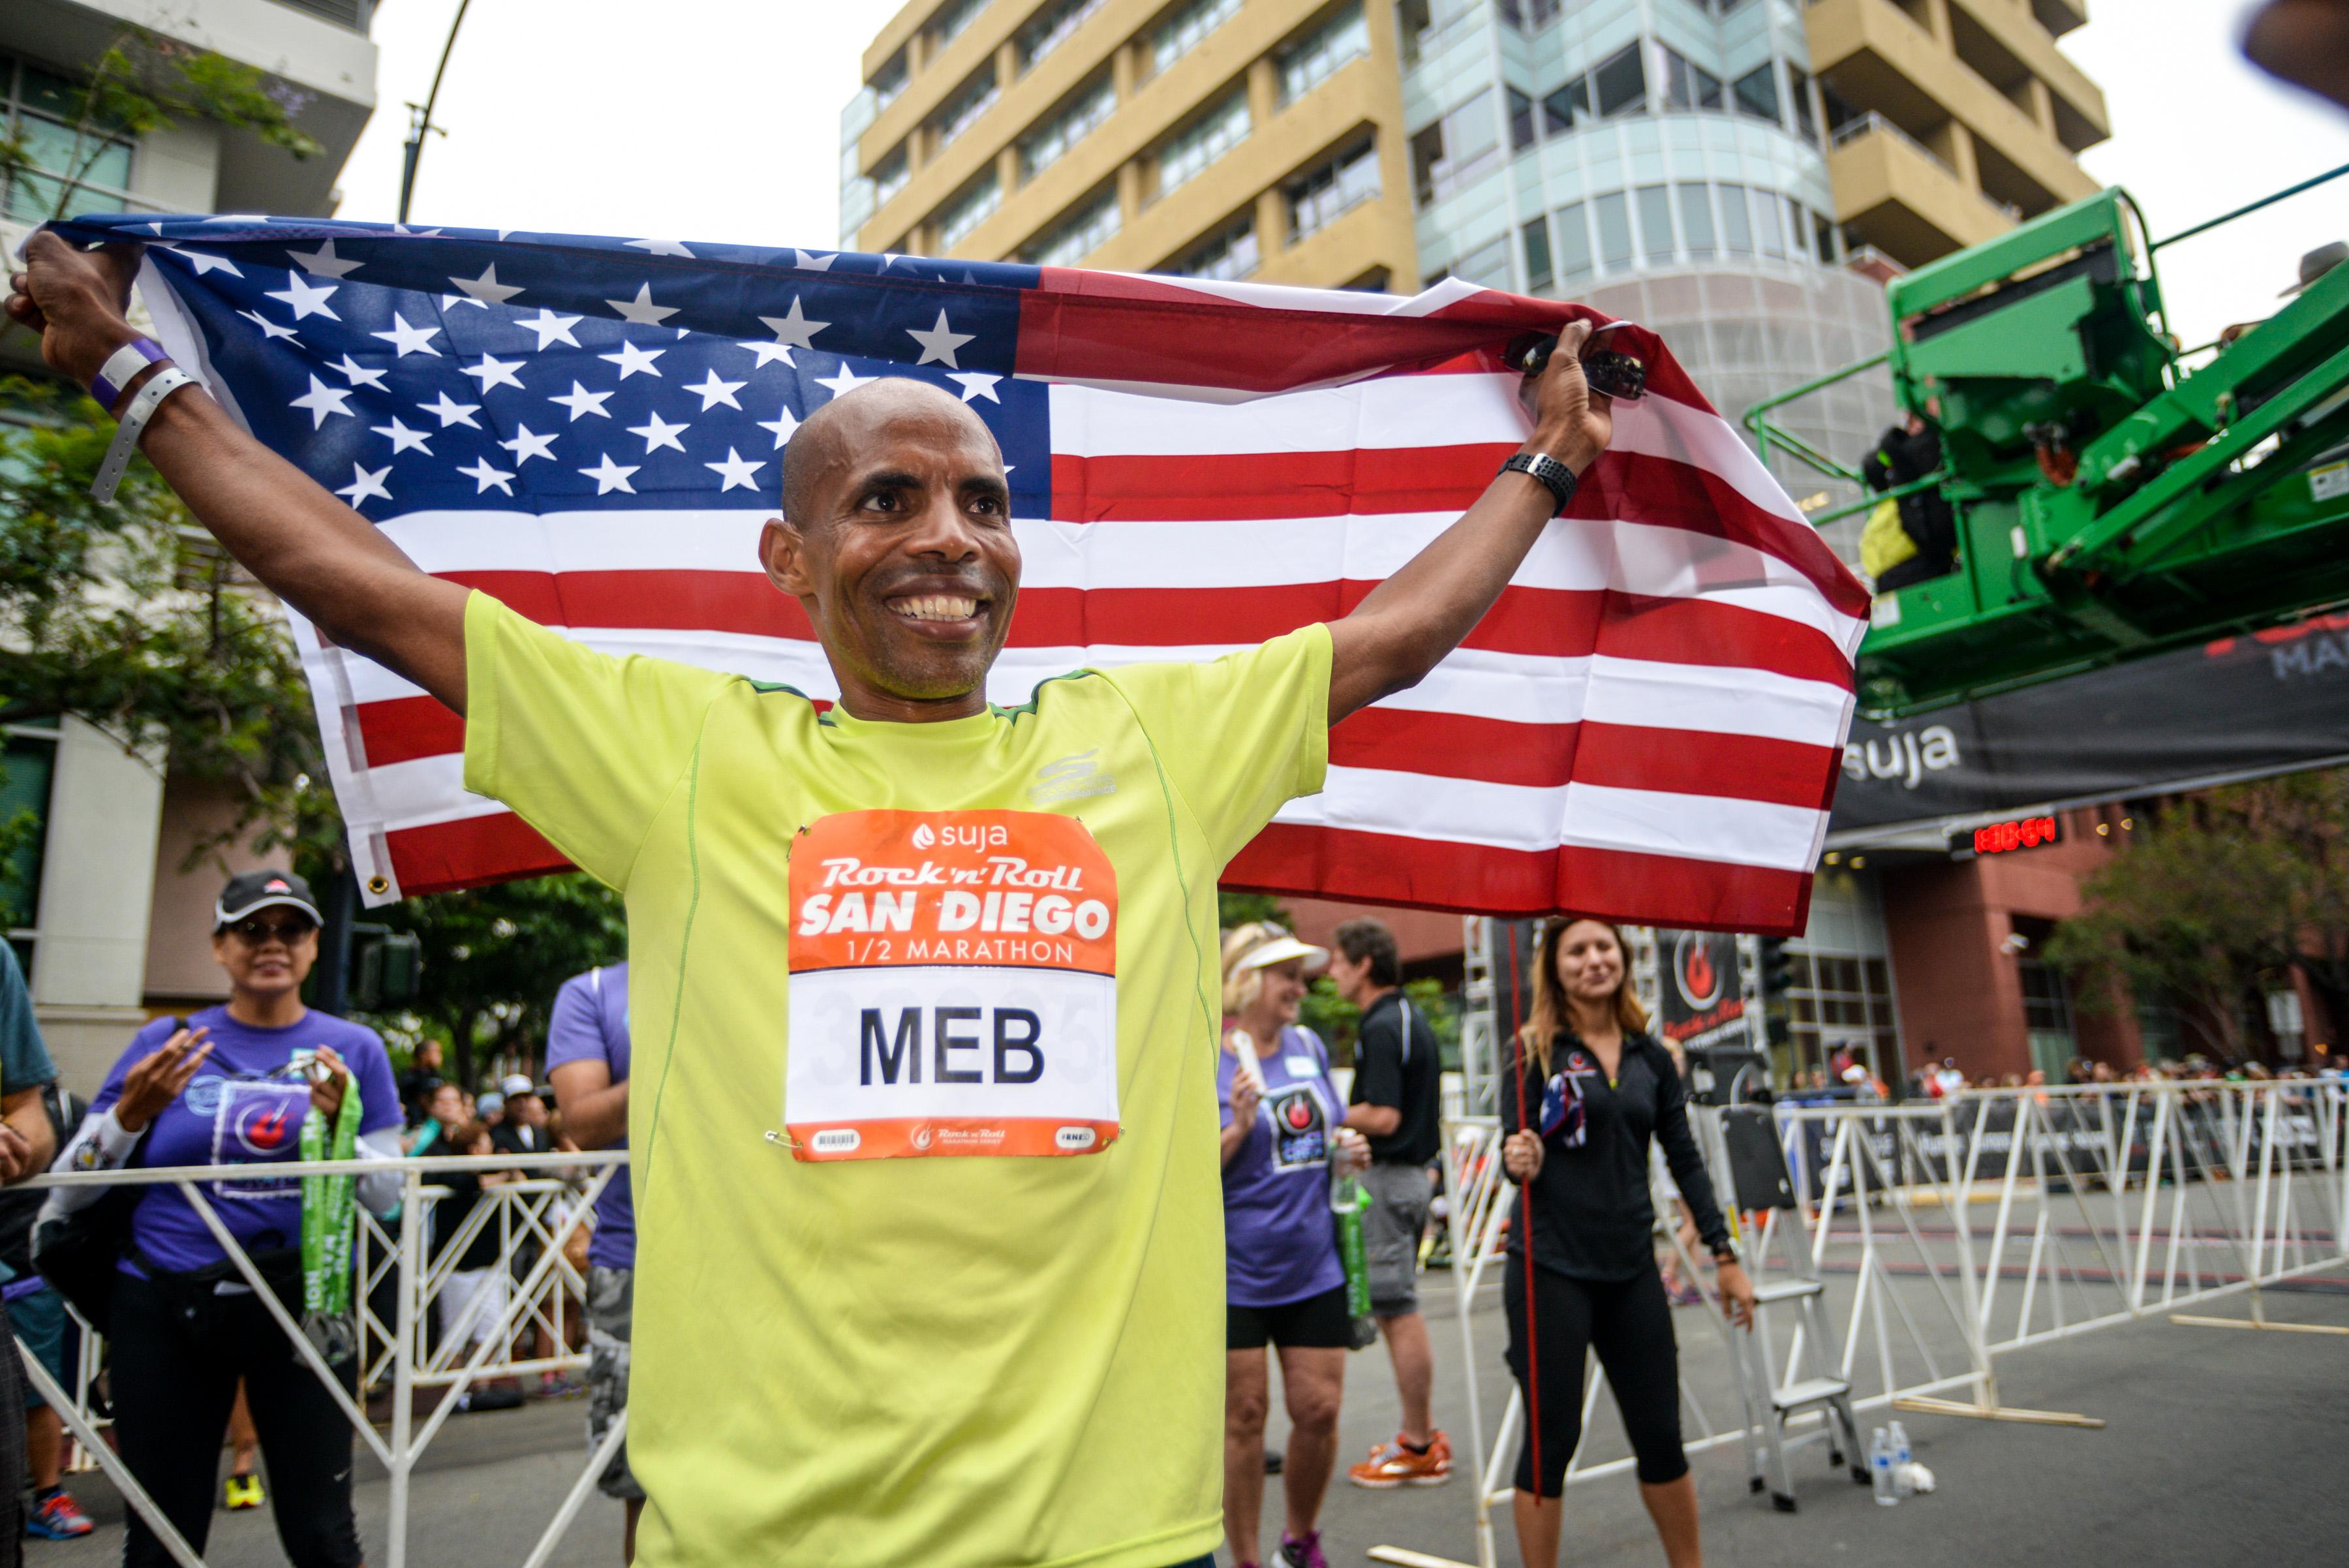 19th Annual Suja Rock 'n' Roll San Diego Marathon & 1/2 Marathon